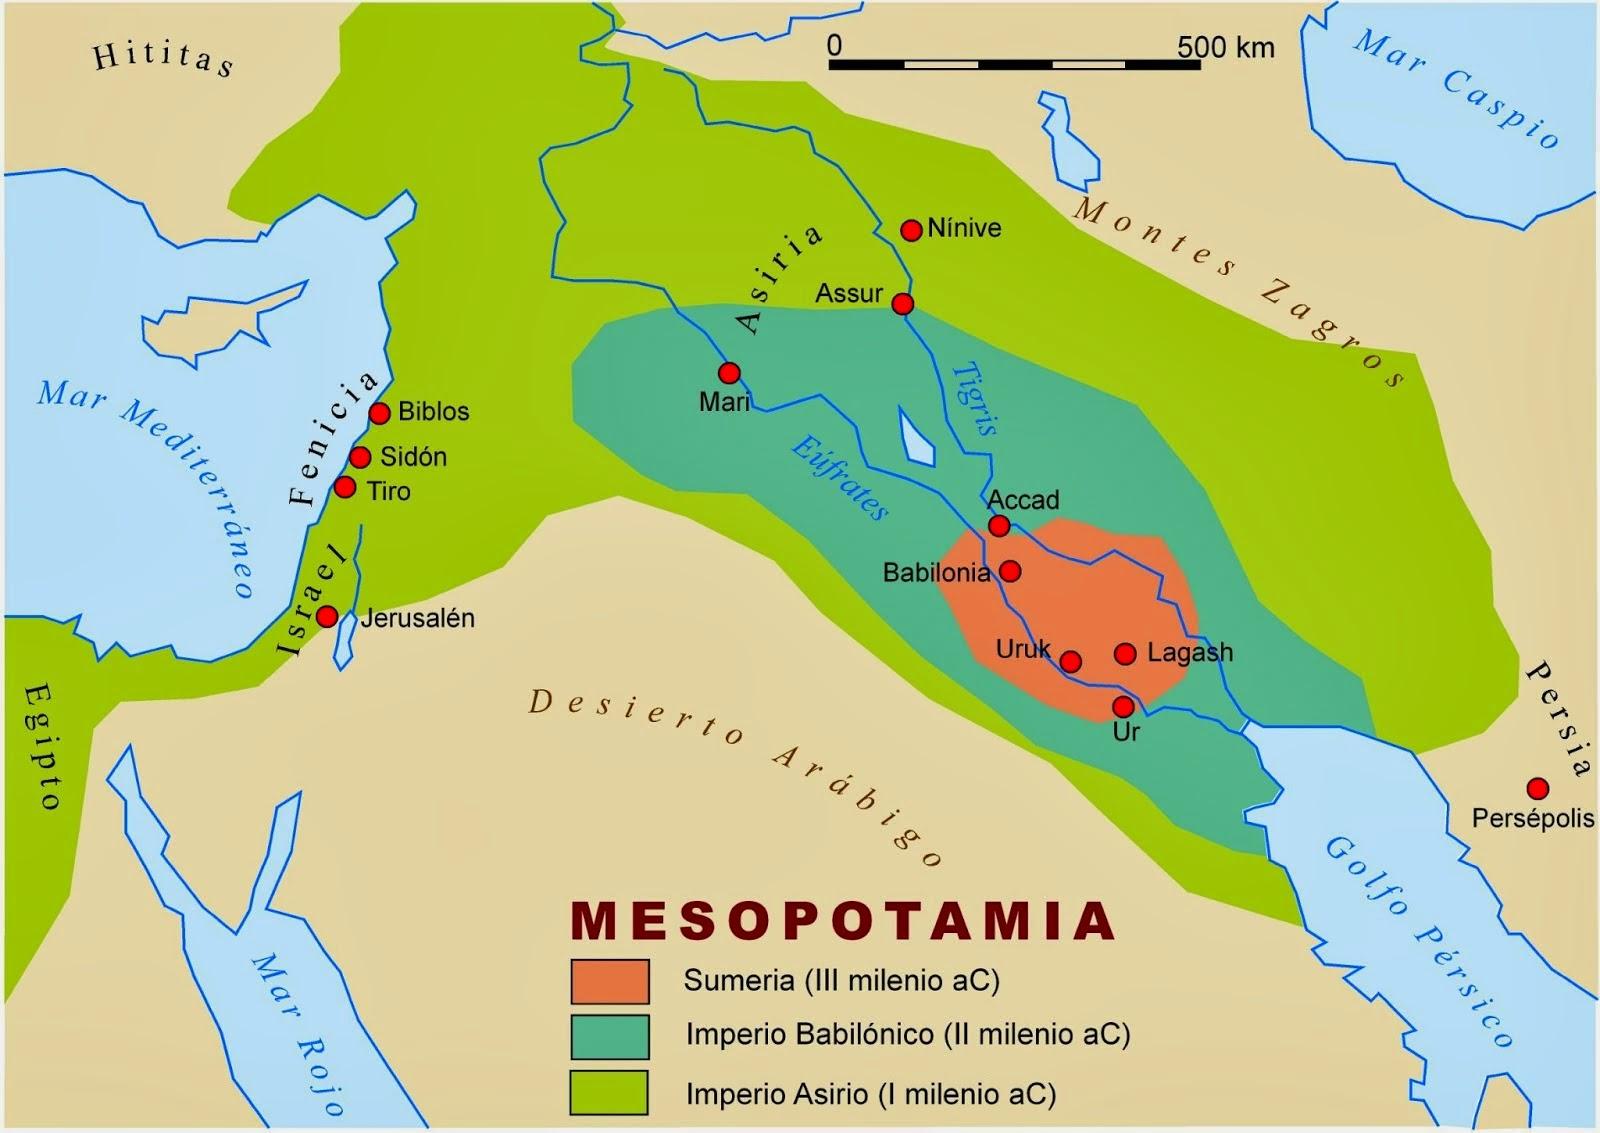 Tigris Y Eufrates Mapa.Mesopotamia Ubicacion Geografica